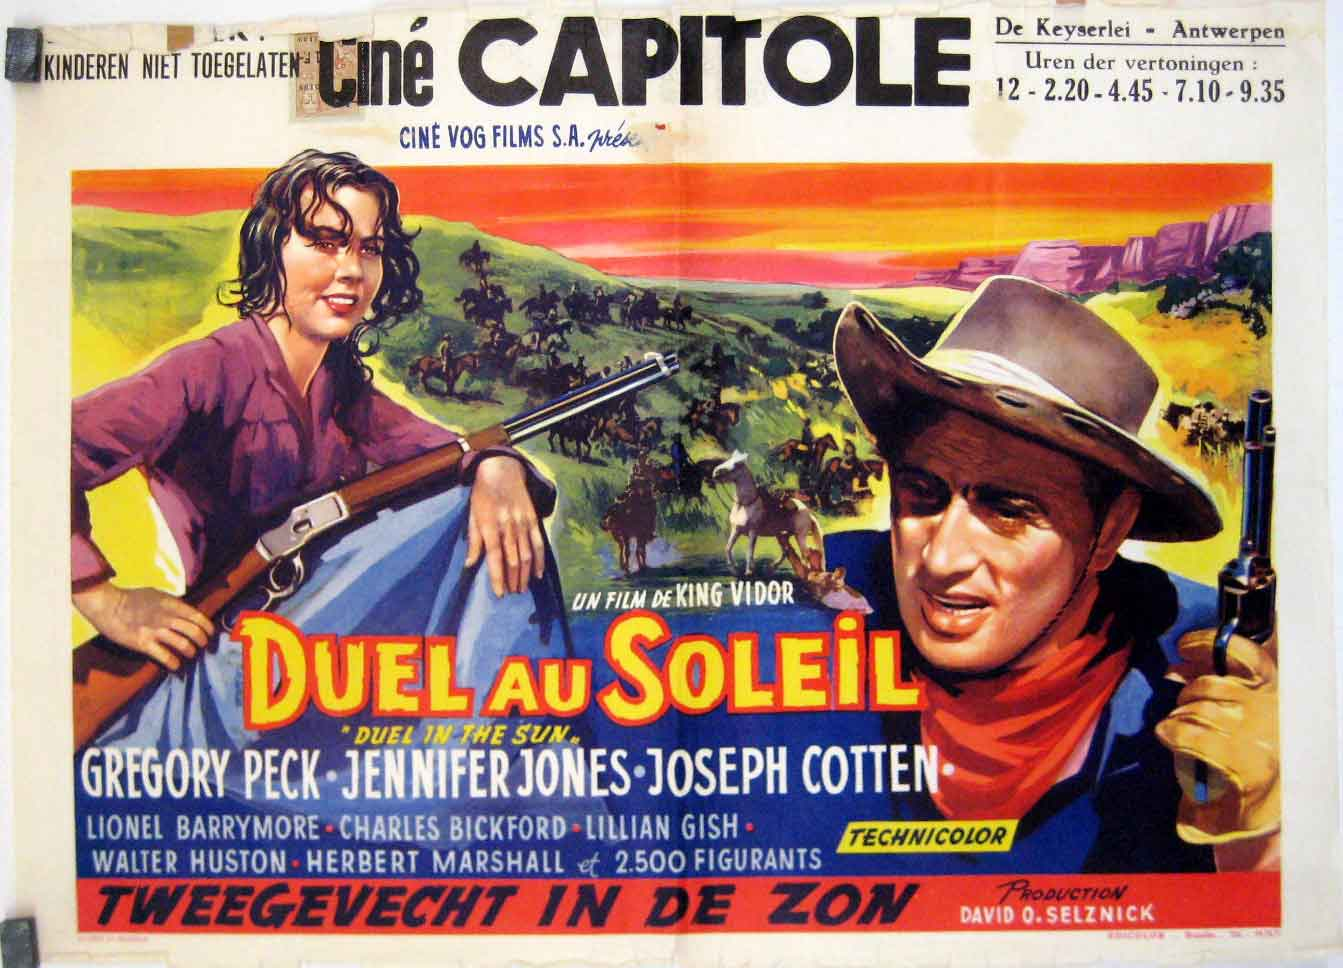 duel in sun poster 1.jpg